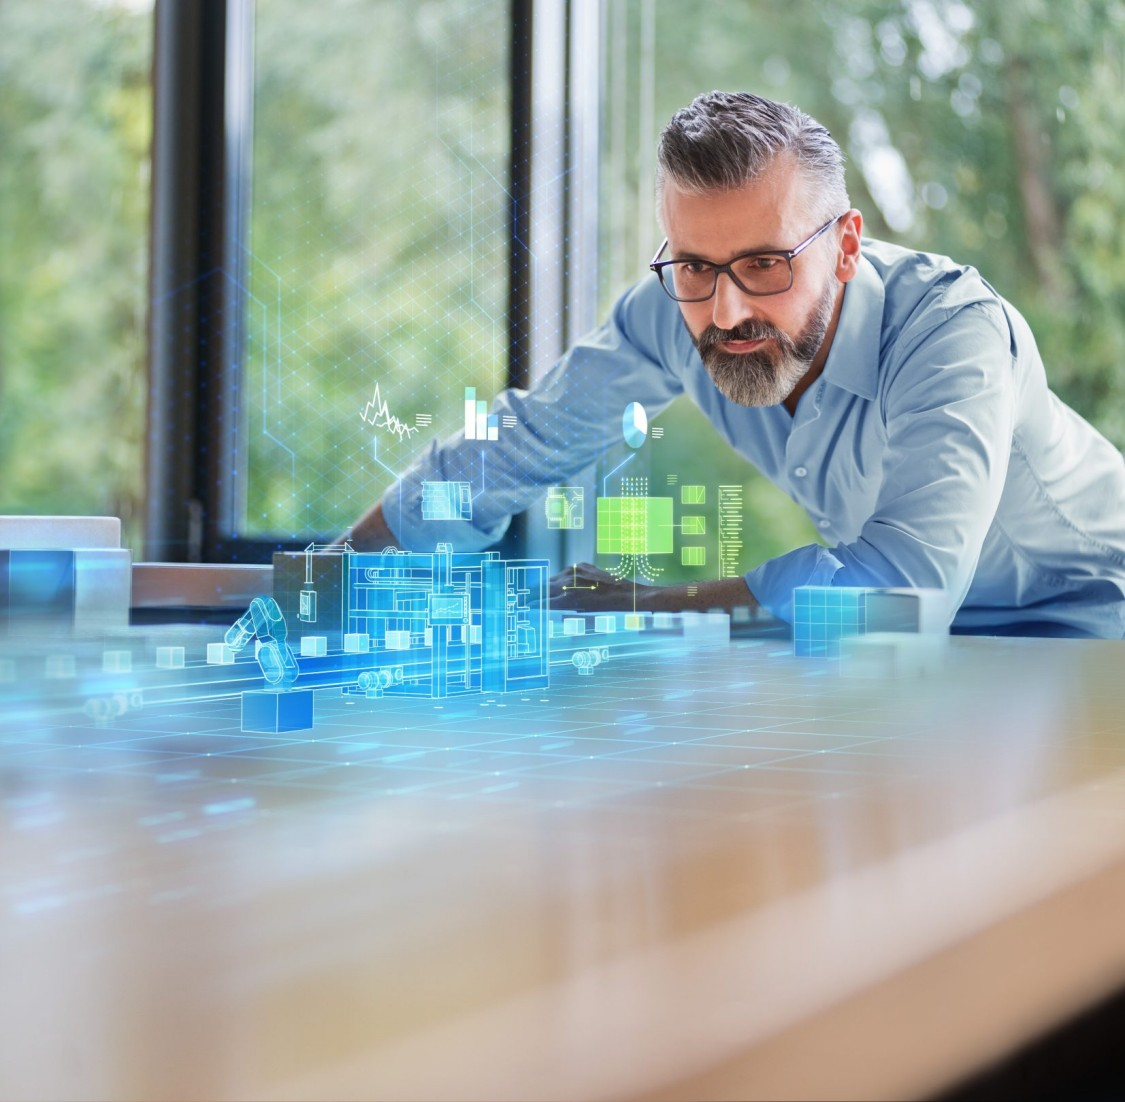 Servitisation and digitalisation